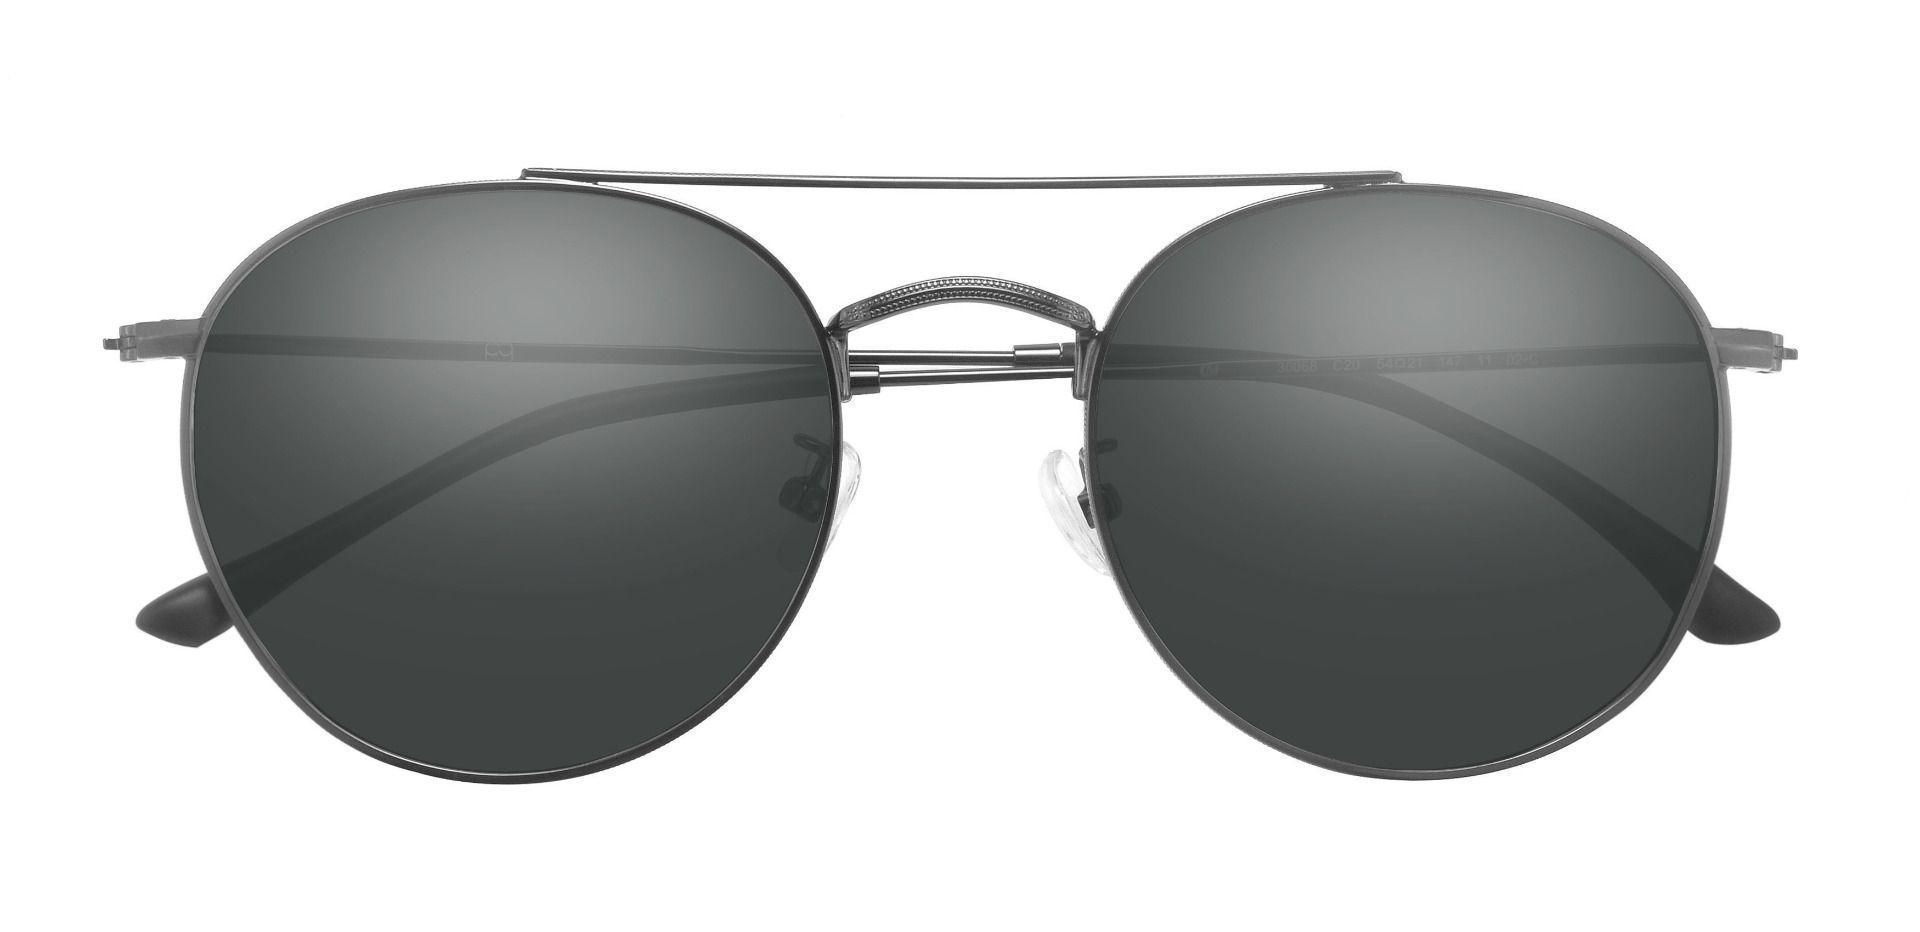 Malik Aviator Prescription Sunglasses - Gray Frame With Gray Lenses